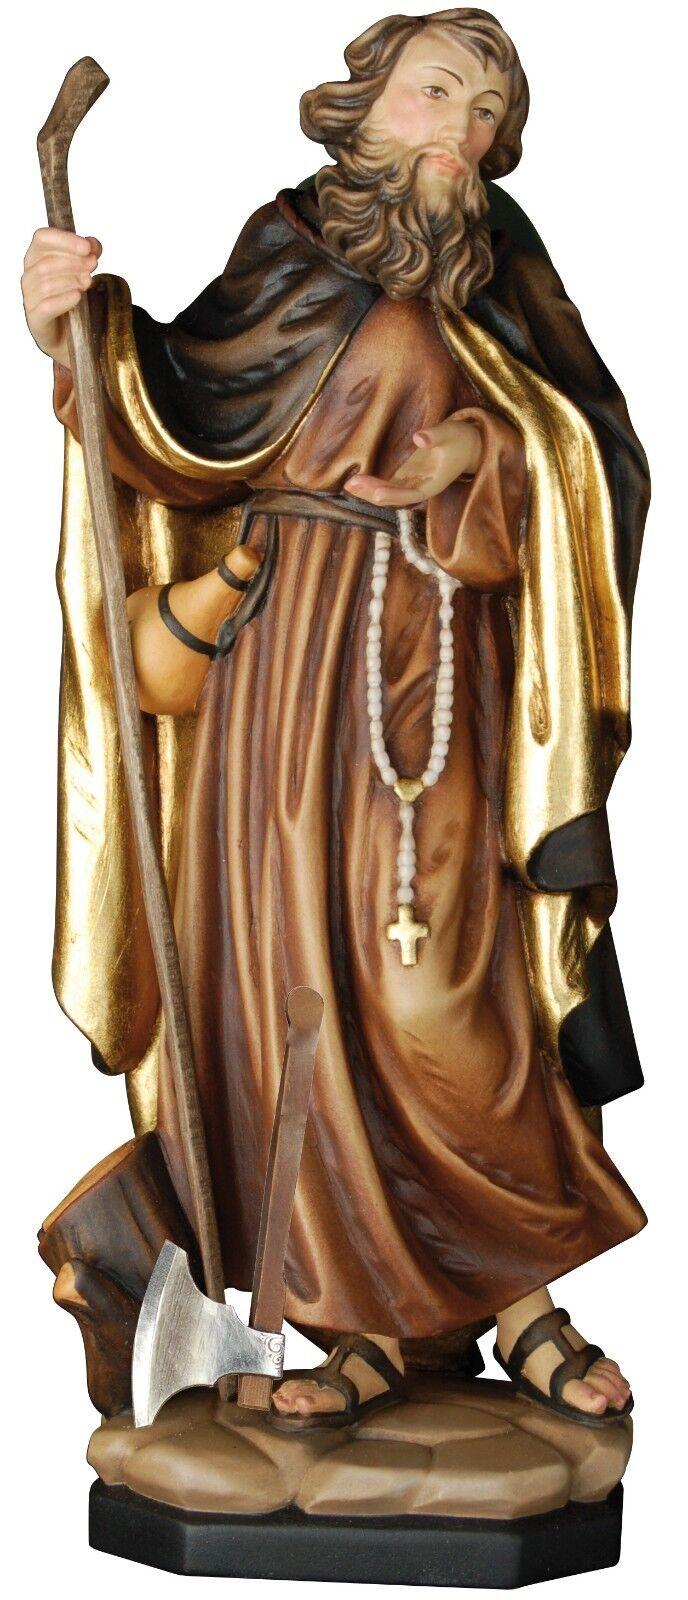 San Giovanni Gualberto mit Axt , st. John Gualbert with Ax wooden Statuen